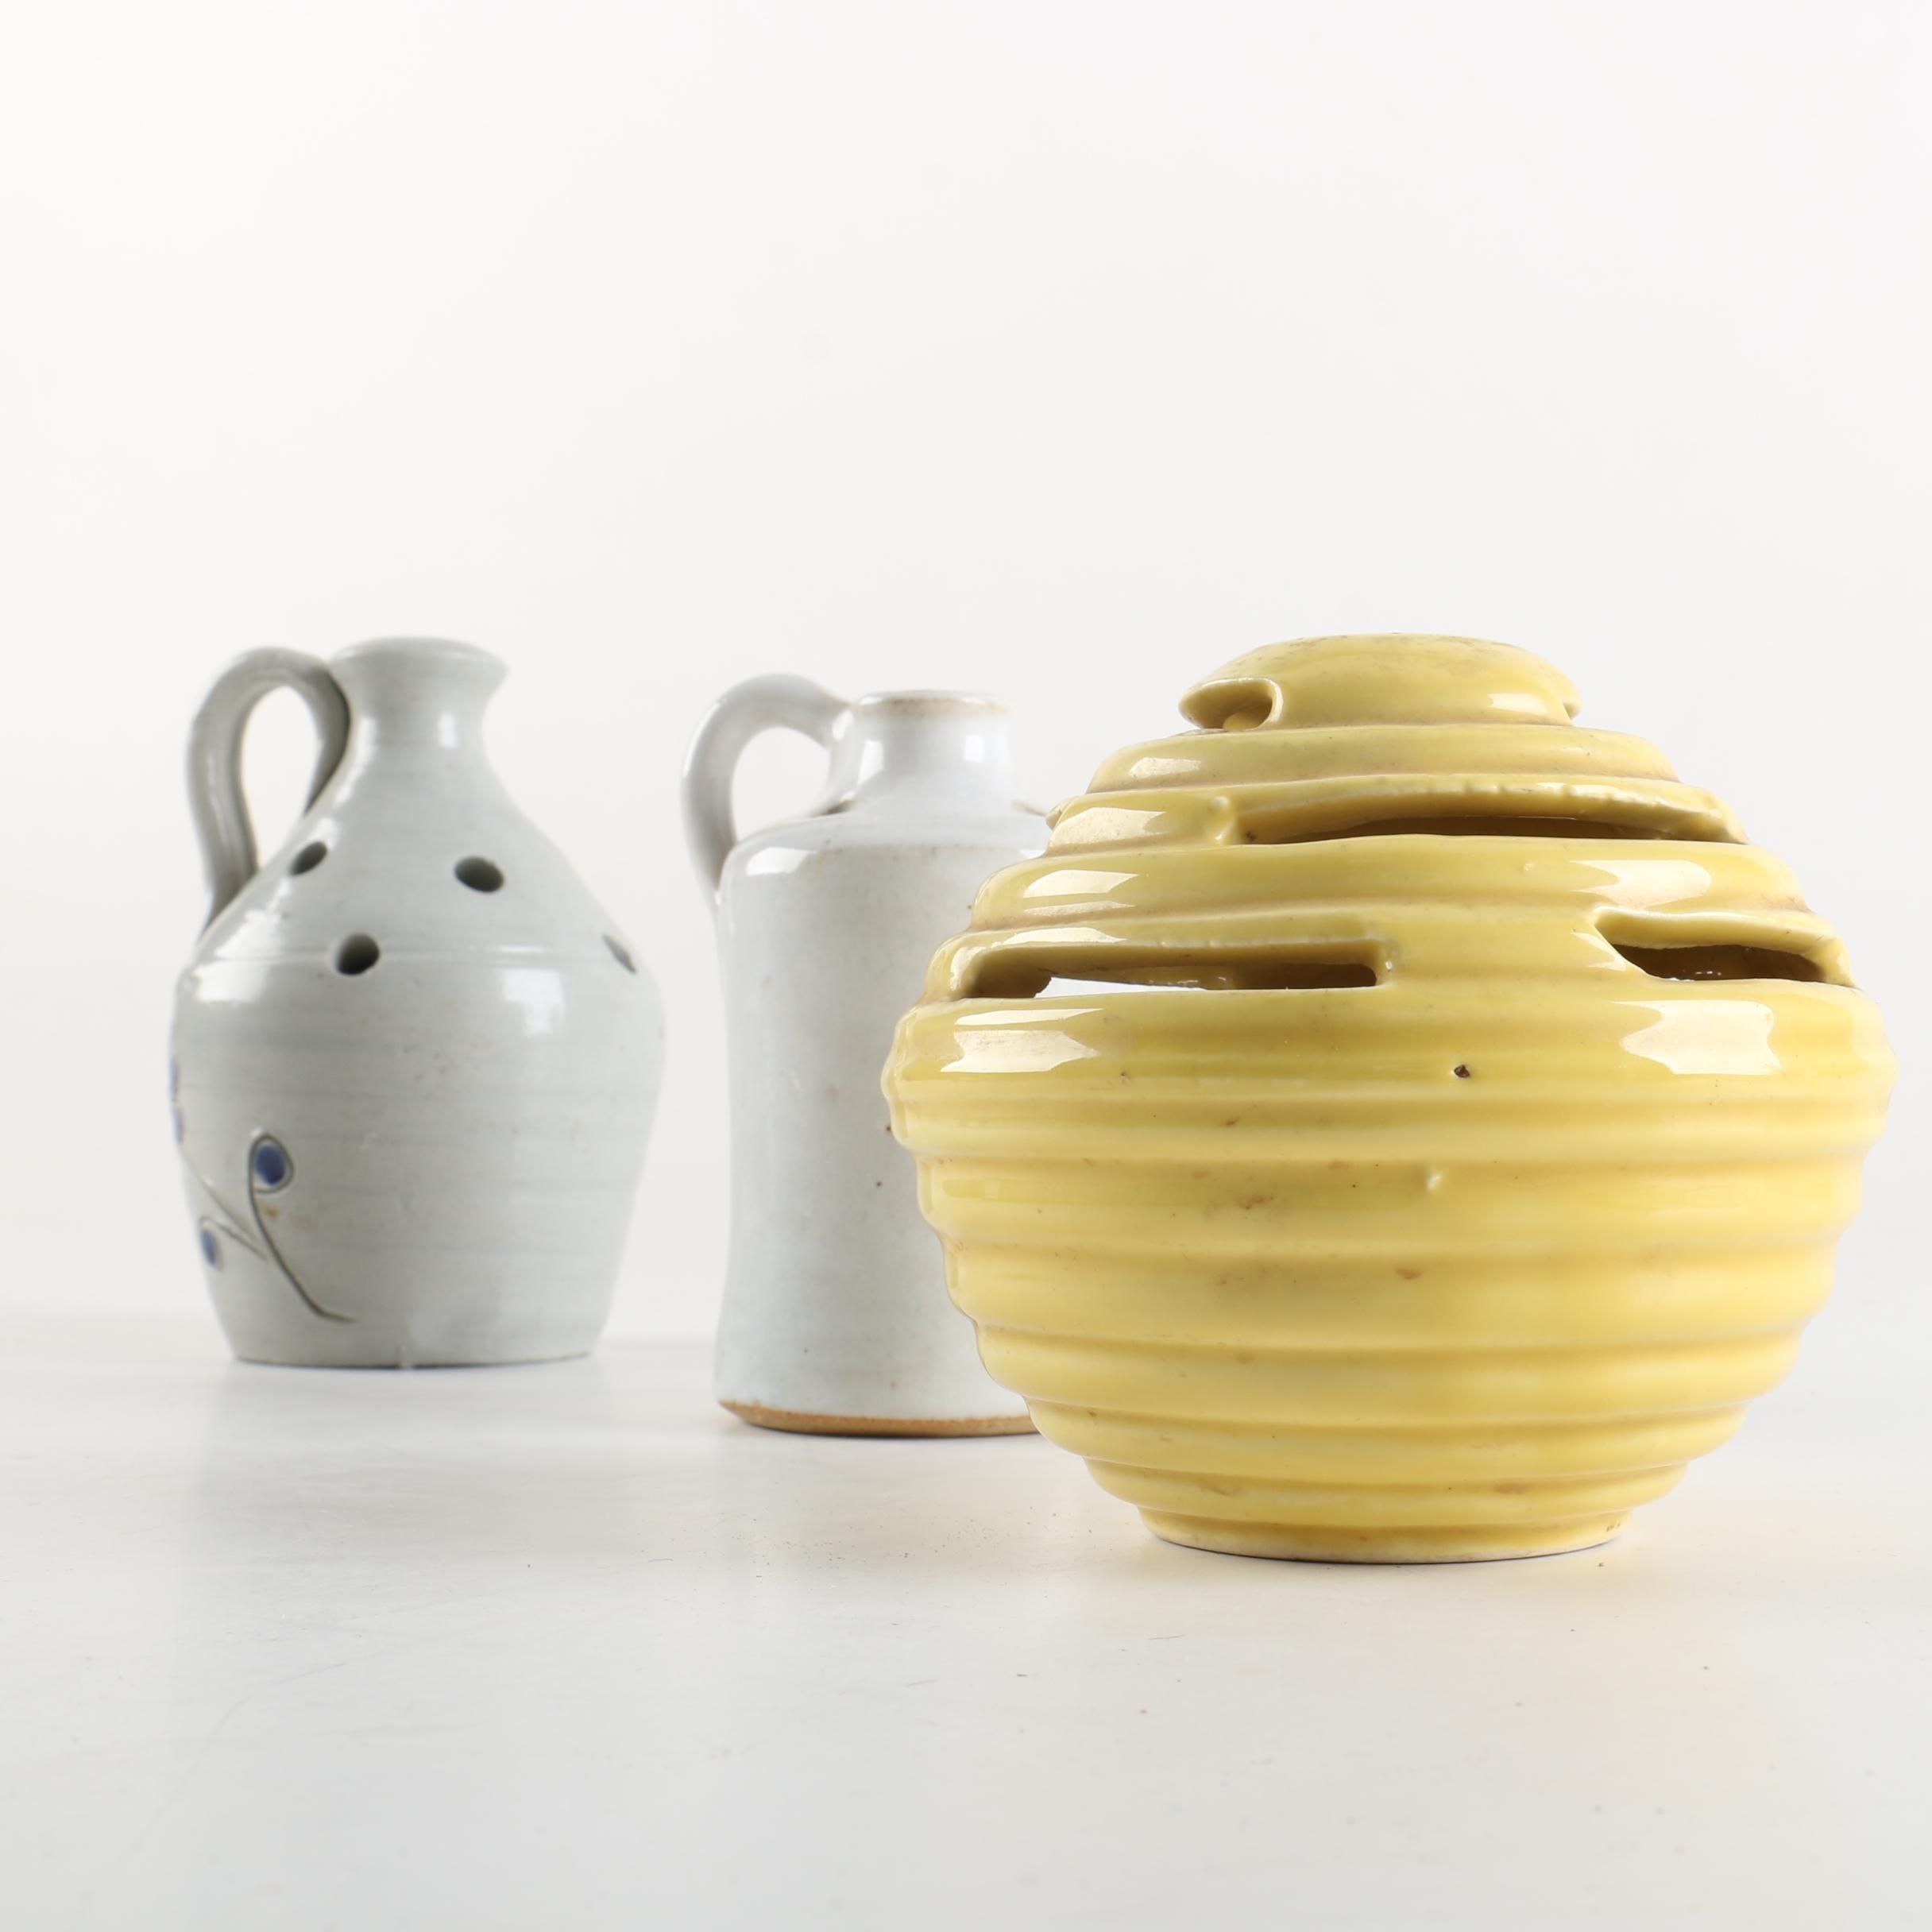 Vintage Art Pottery Flower Frog Vases Featuring Mid-century Camark